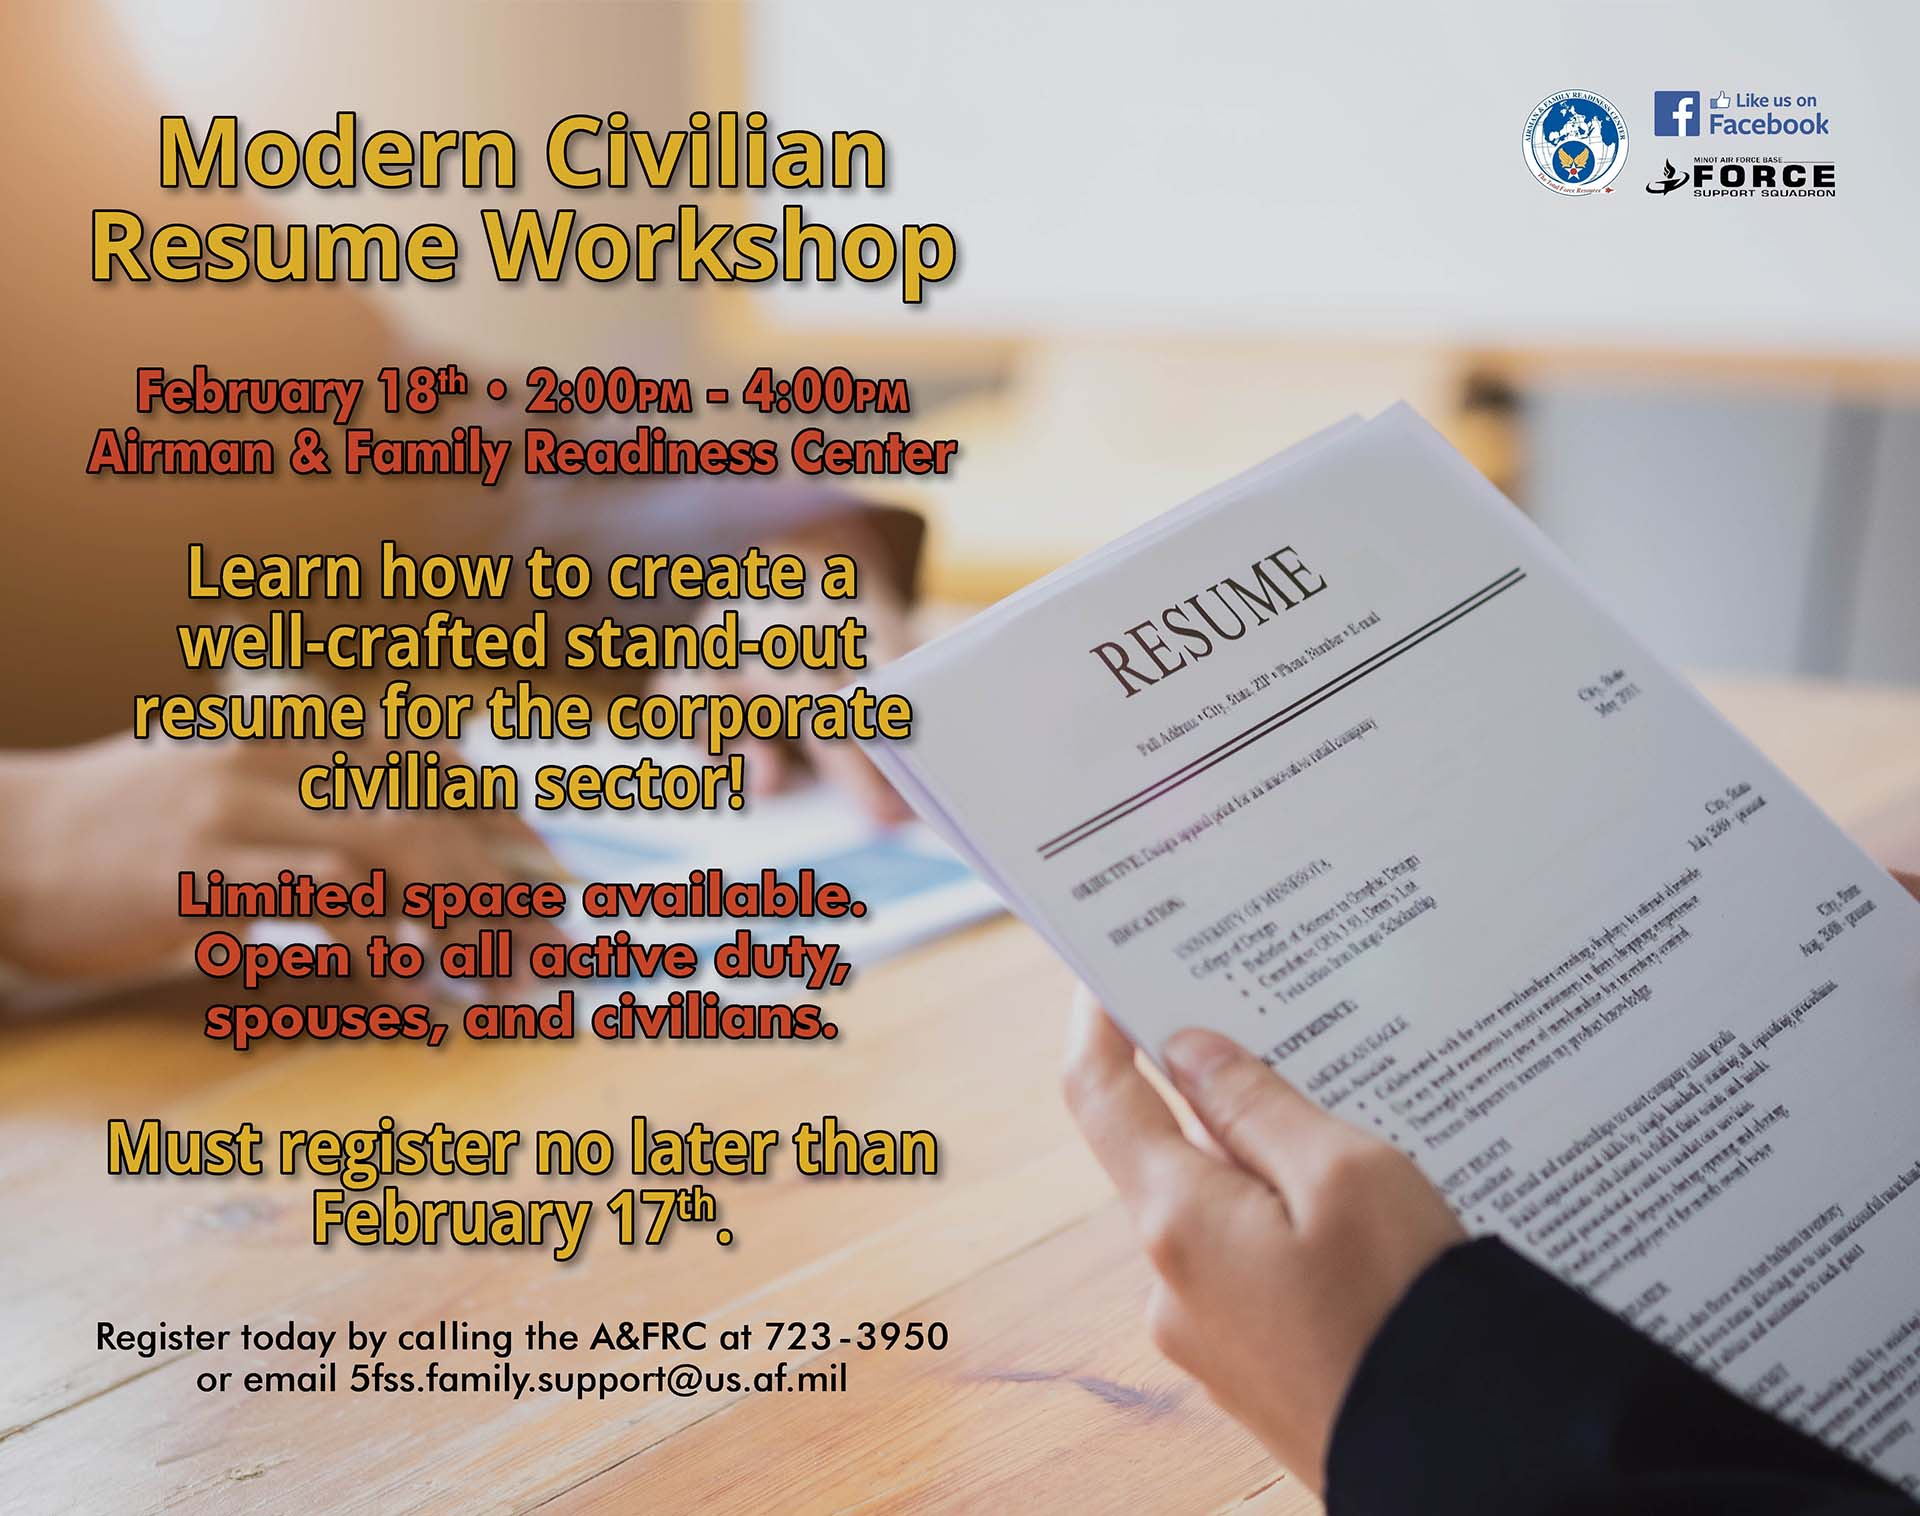 Modern Civilian Resume Workshop